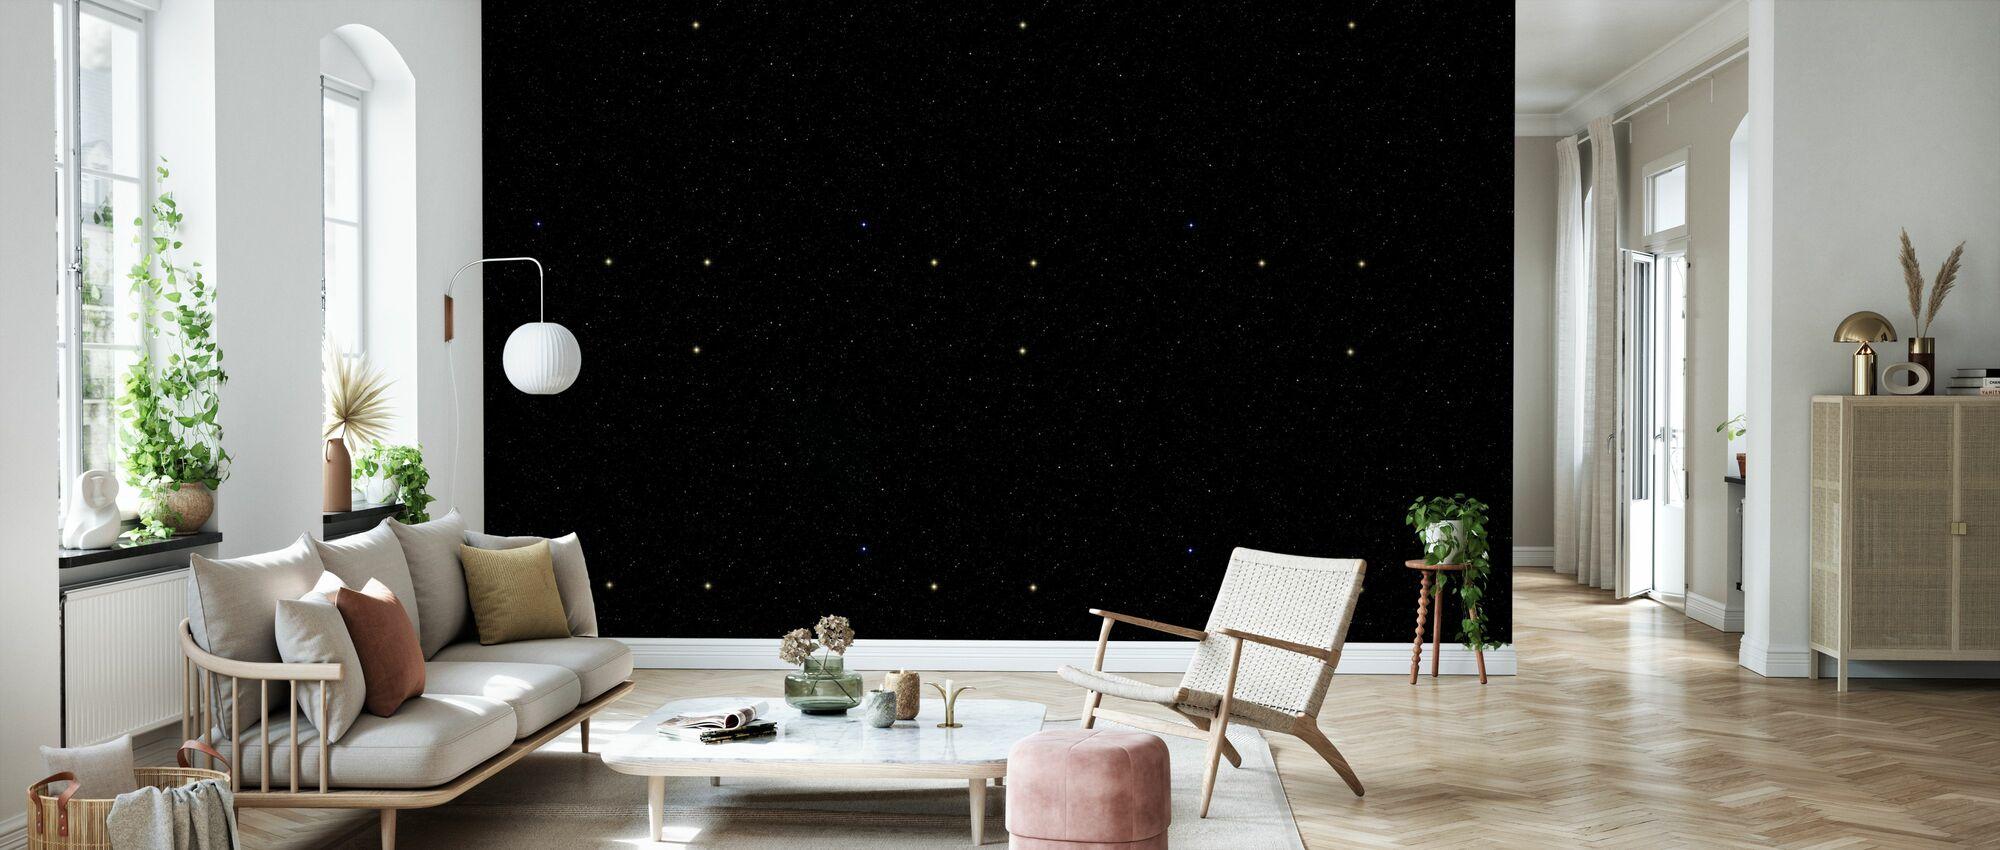 Sky Patch - Wallpaper - Living Room